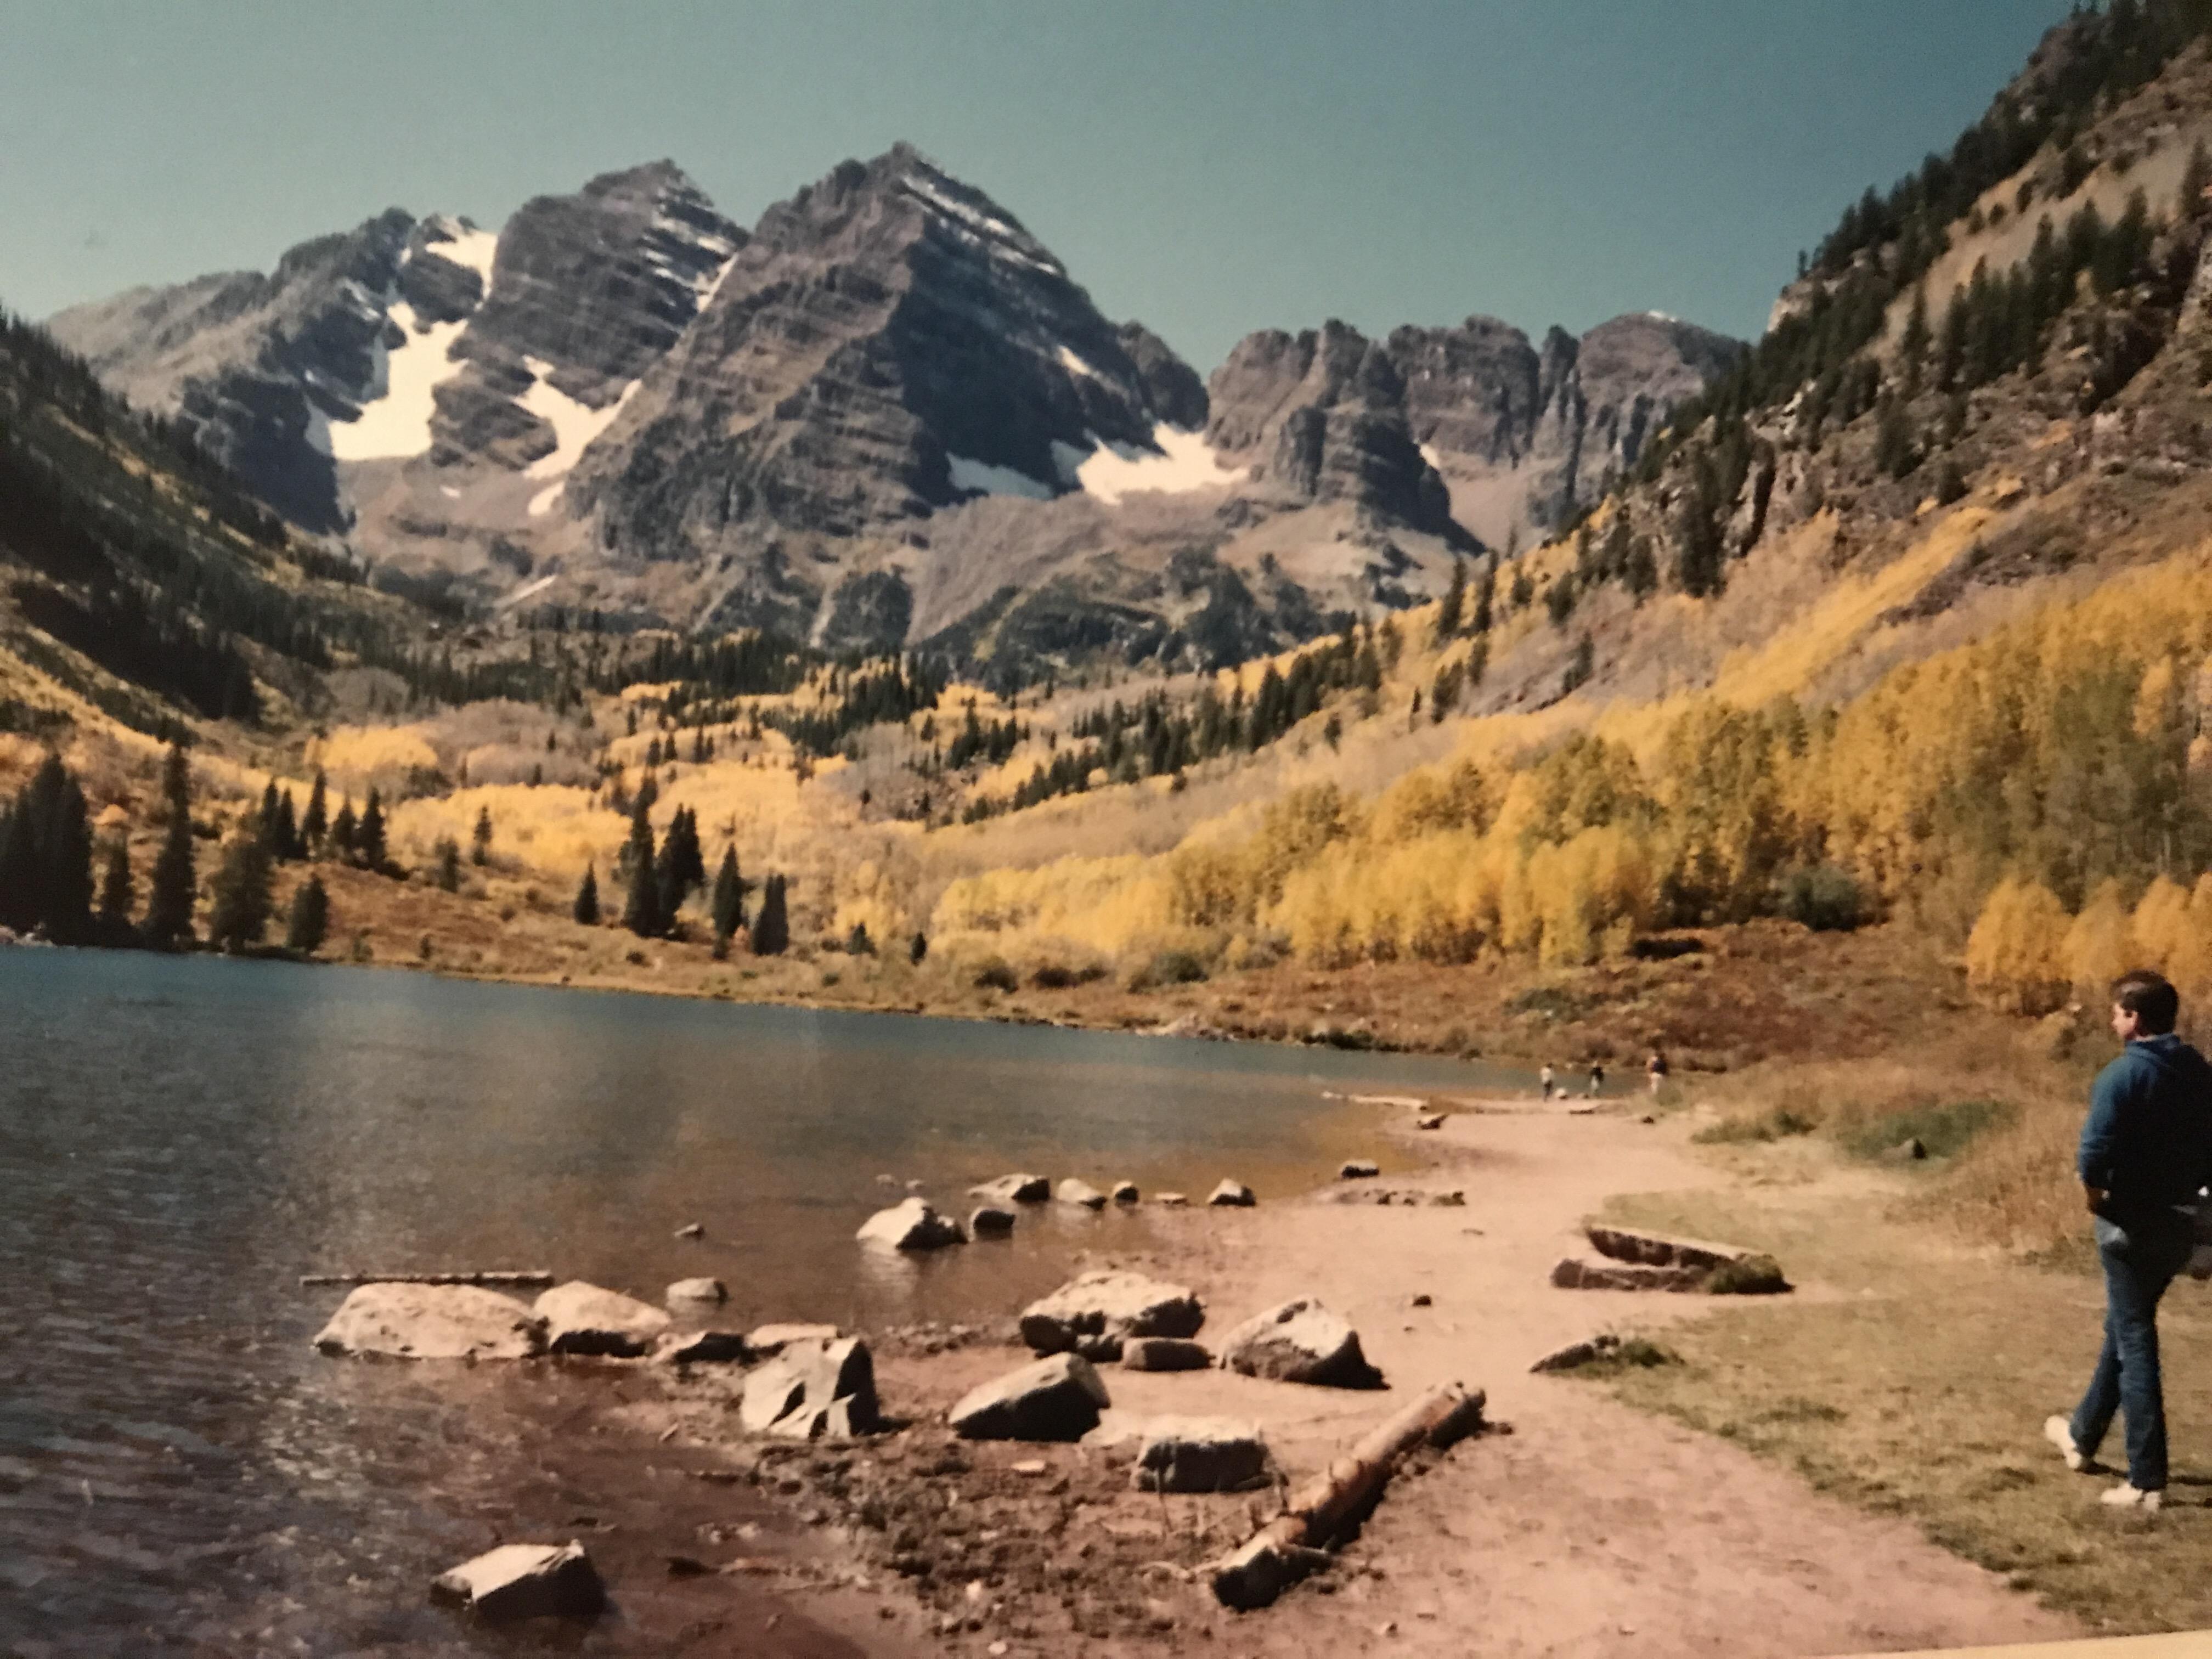 Road trip USA Aspen Colorado